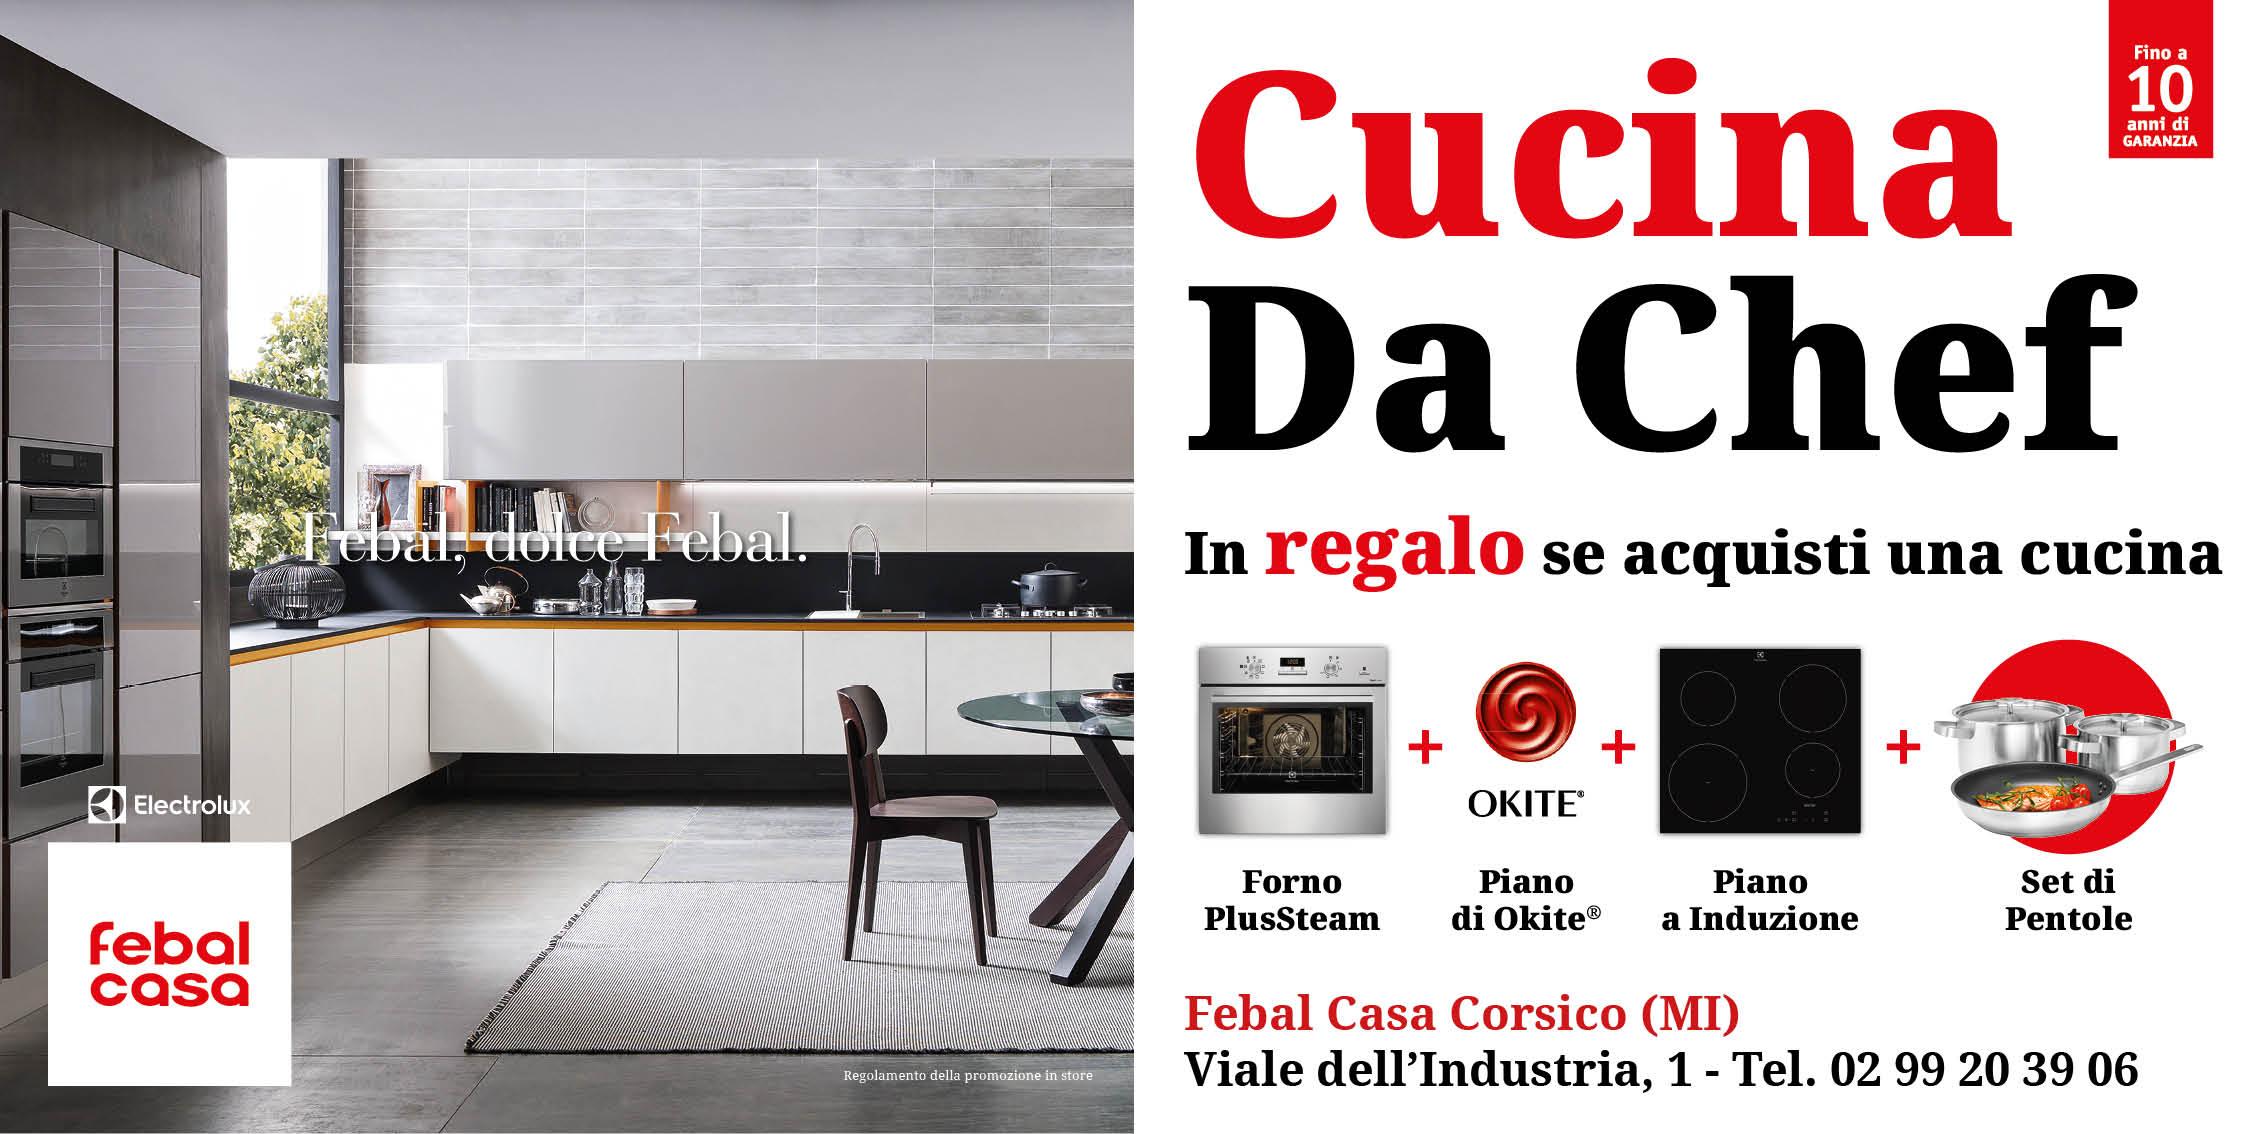 6x3_FC_Corsico - Cucina da Chef_billboard